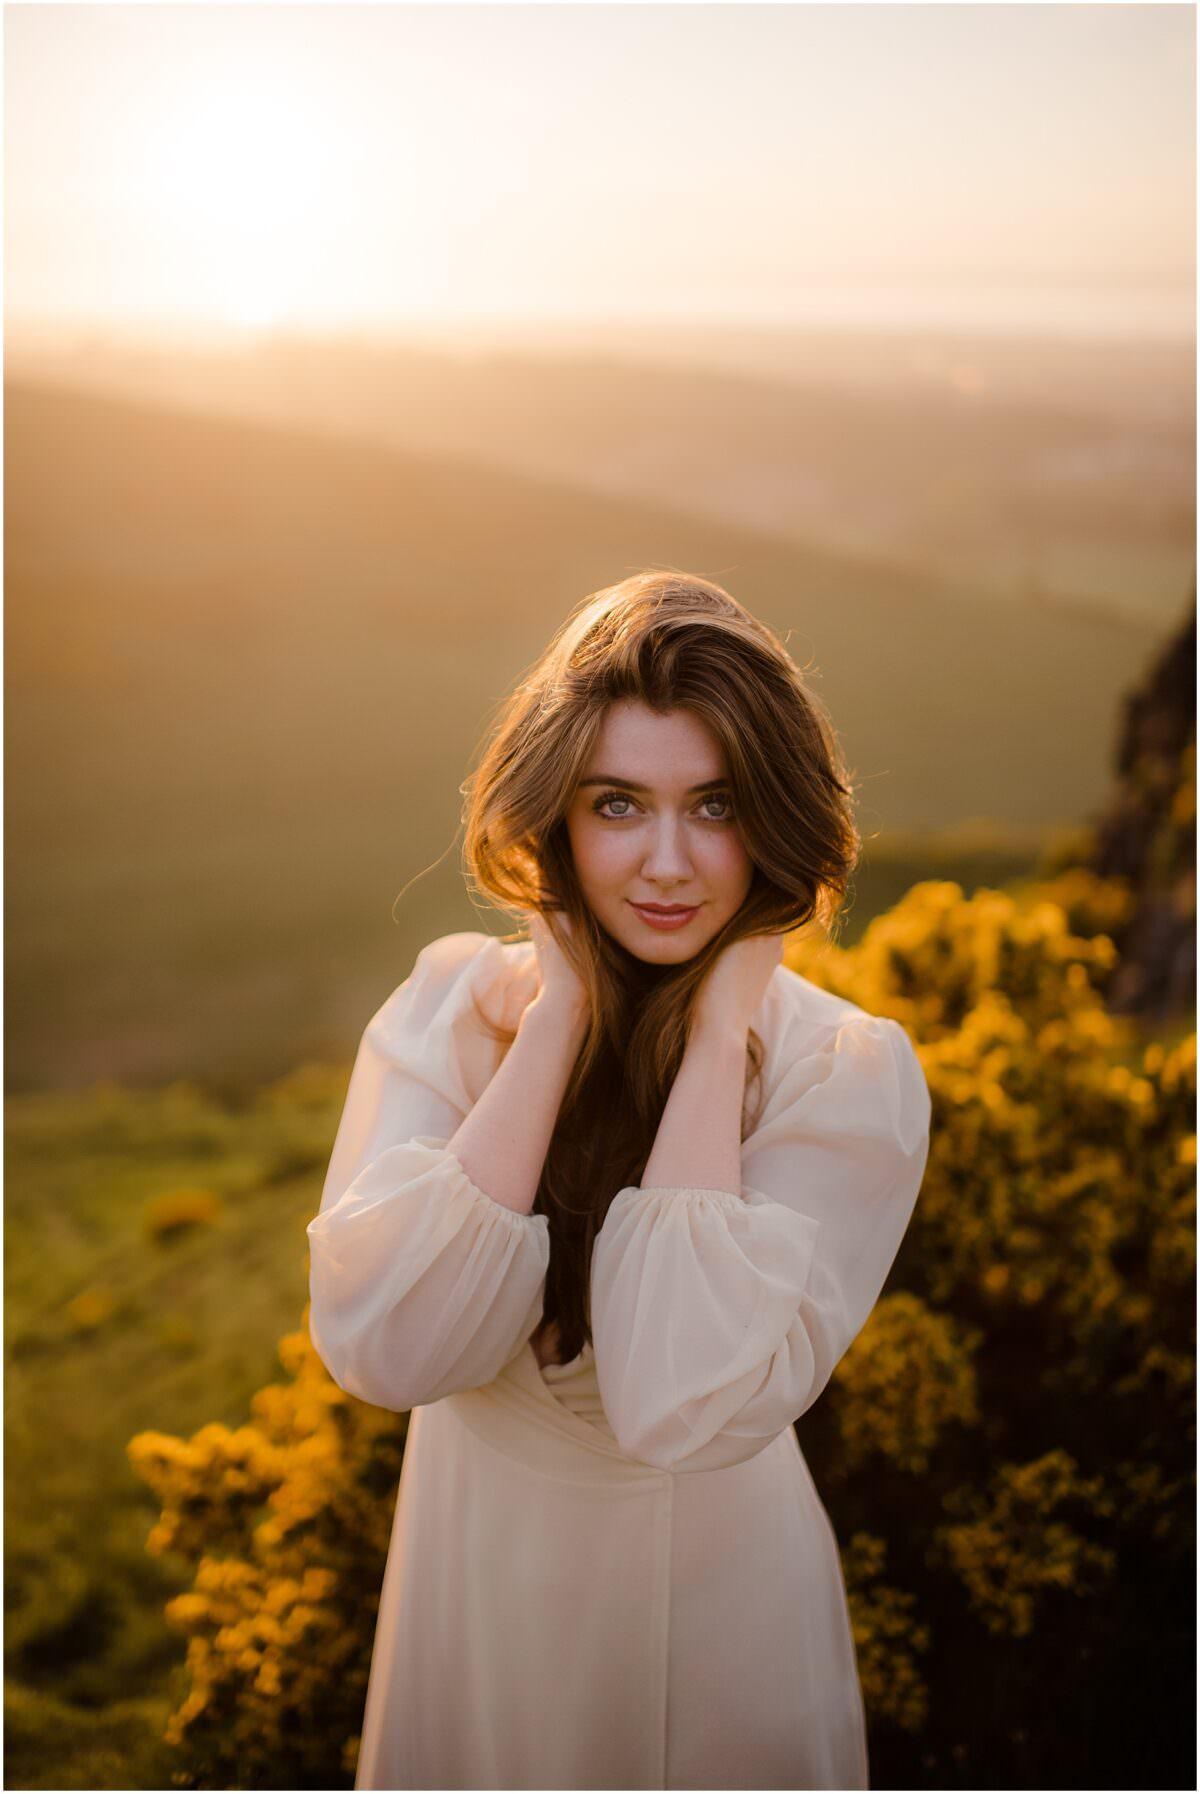 Edinburgh portrait photographer - Arthur's Seat sunset portrait photoshoot in Edinburgh